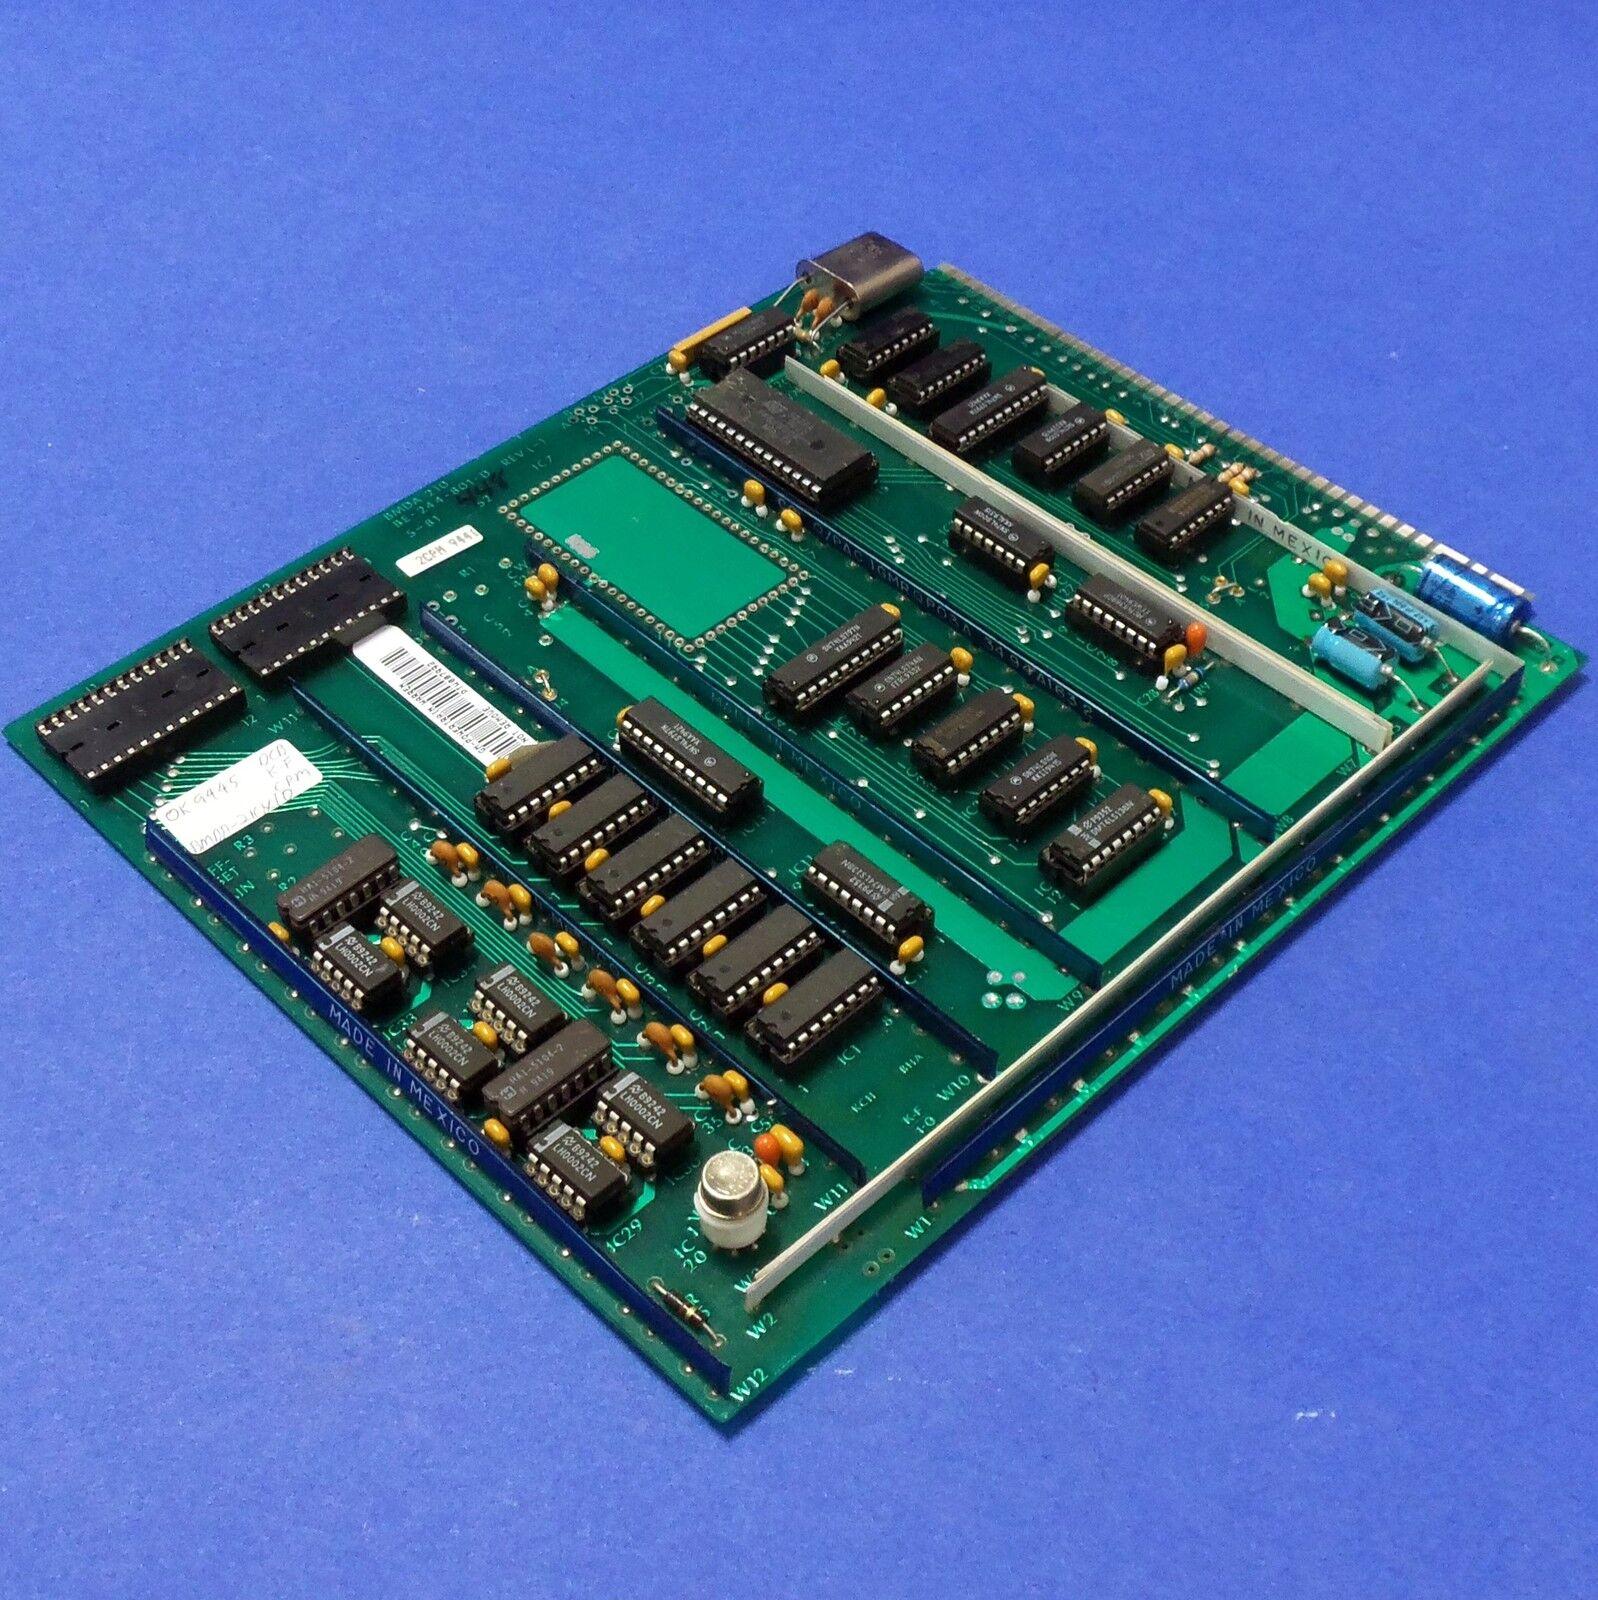 CIRCUIT BOARD BMDA 210 BE-244-801-D REV (-) PZB